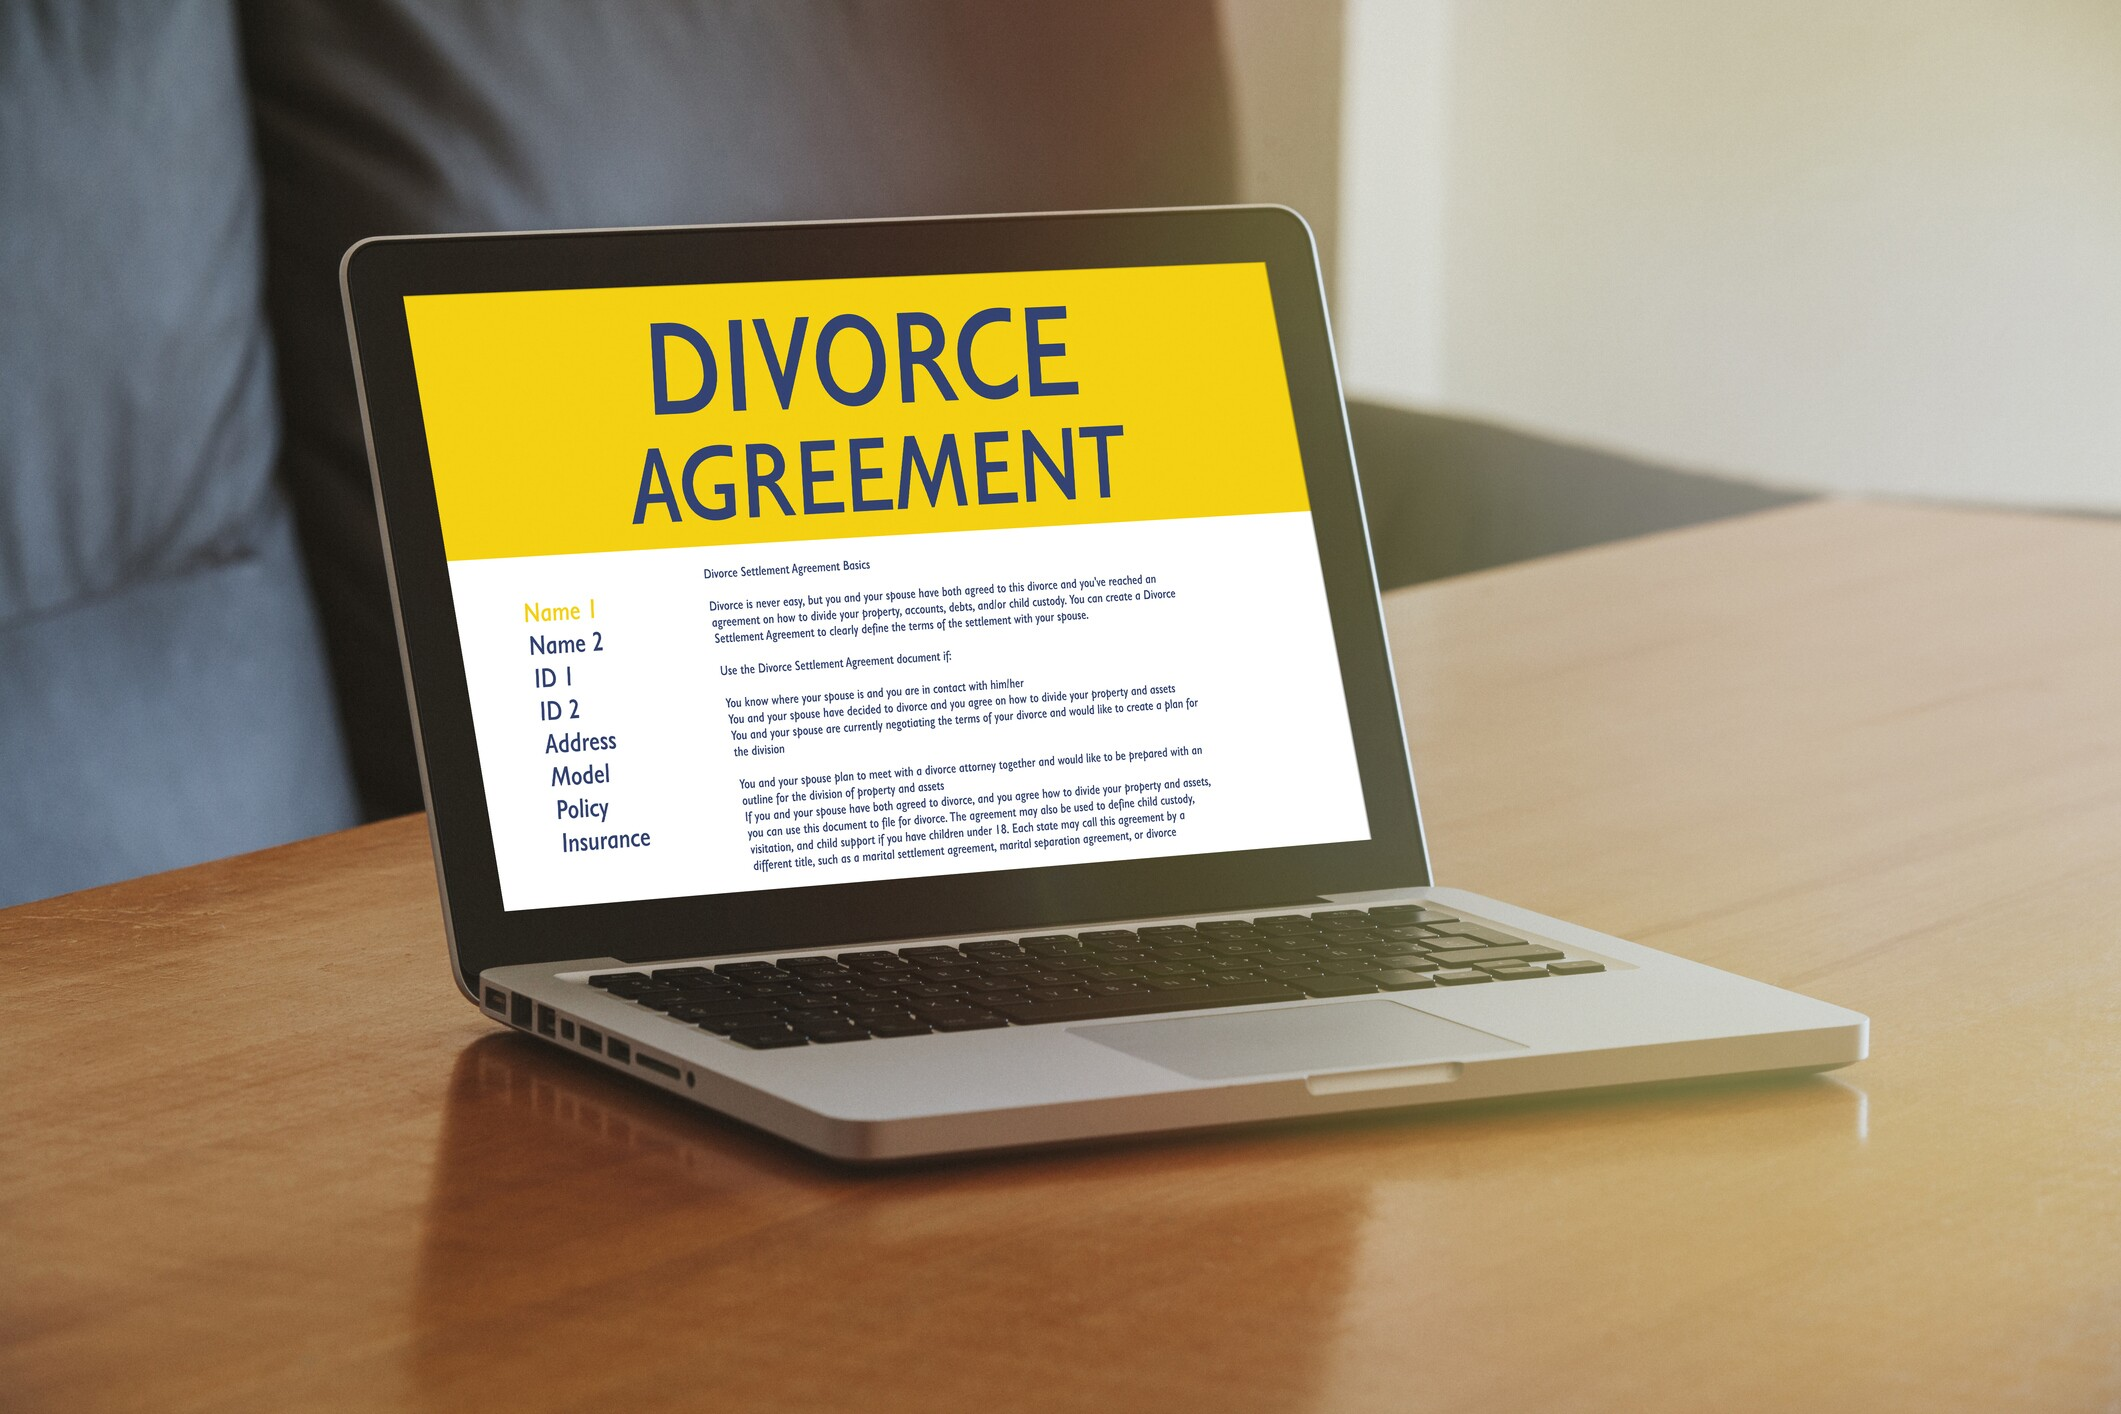 New York Times Runs Glowing Profile Of Internet Divorce Service